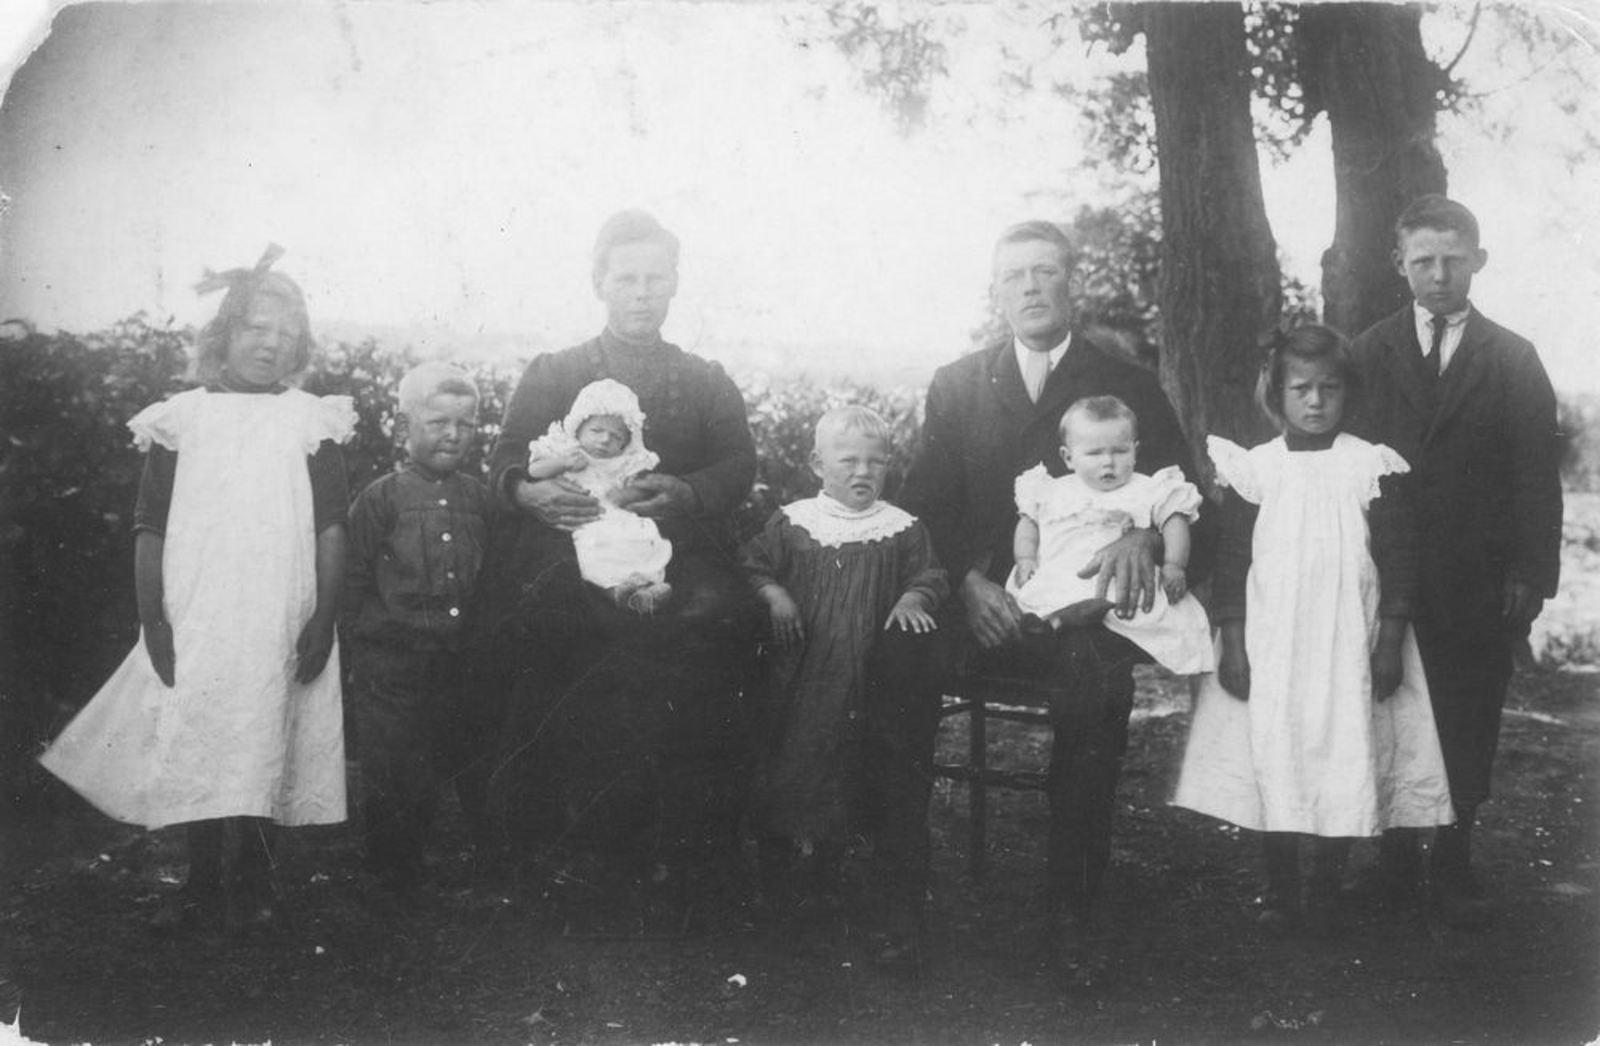 Bliek Jakobus 1883 1920- Familiefoto